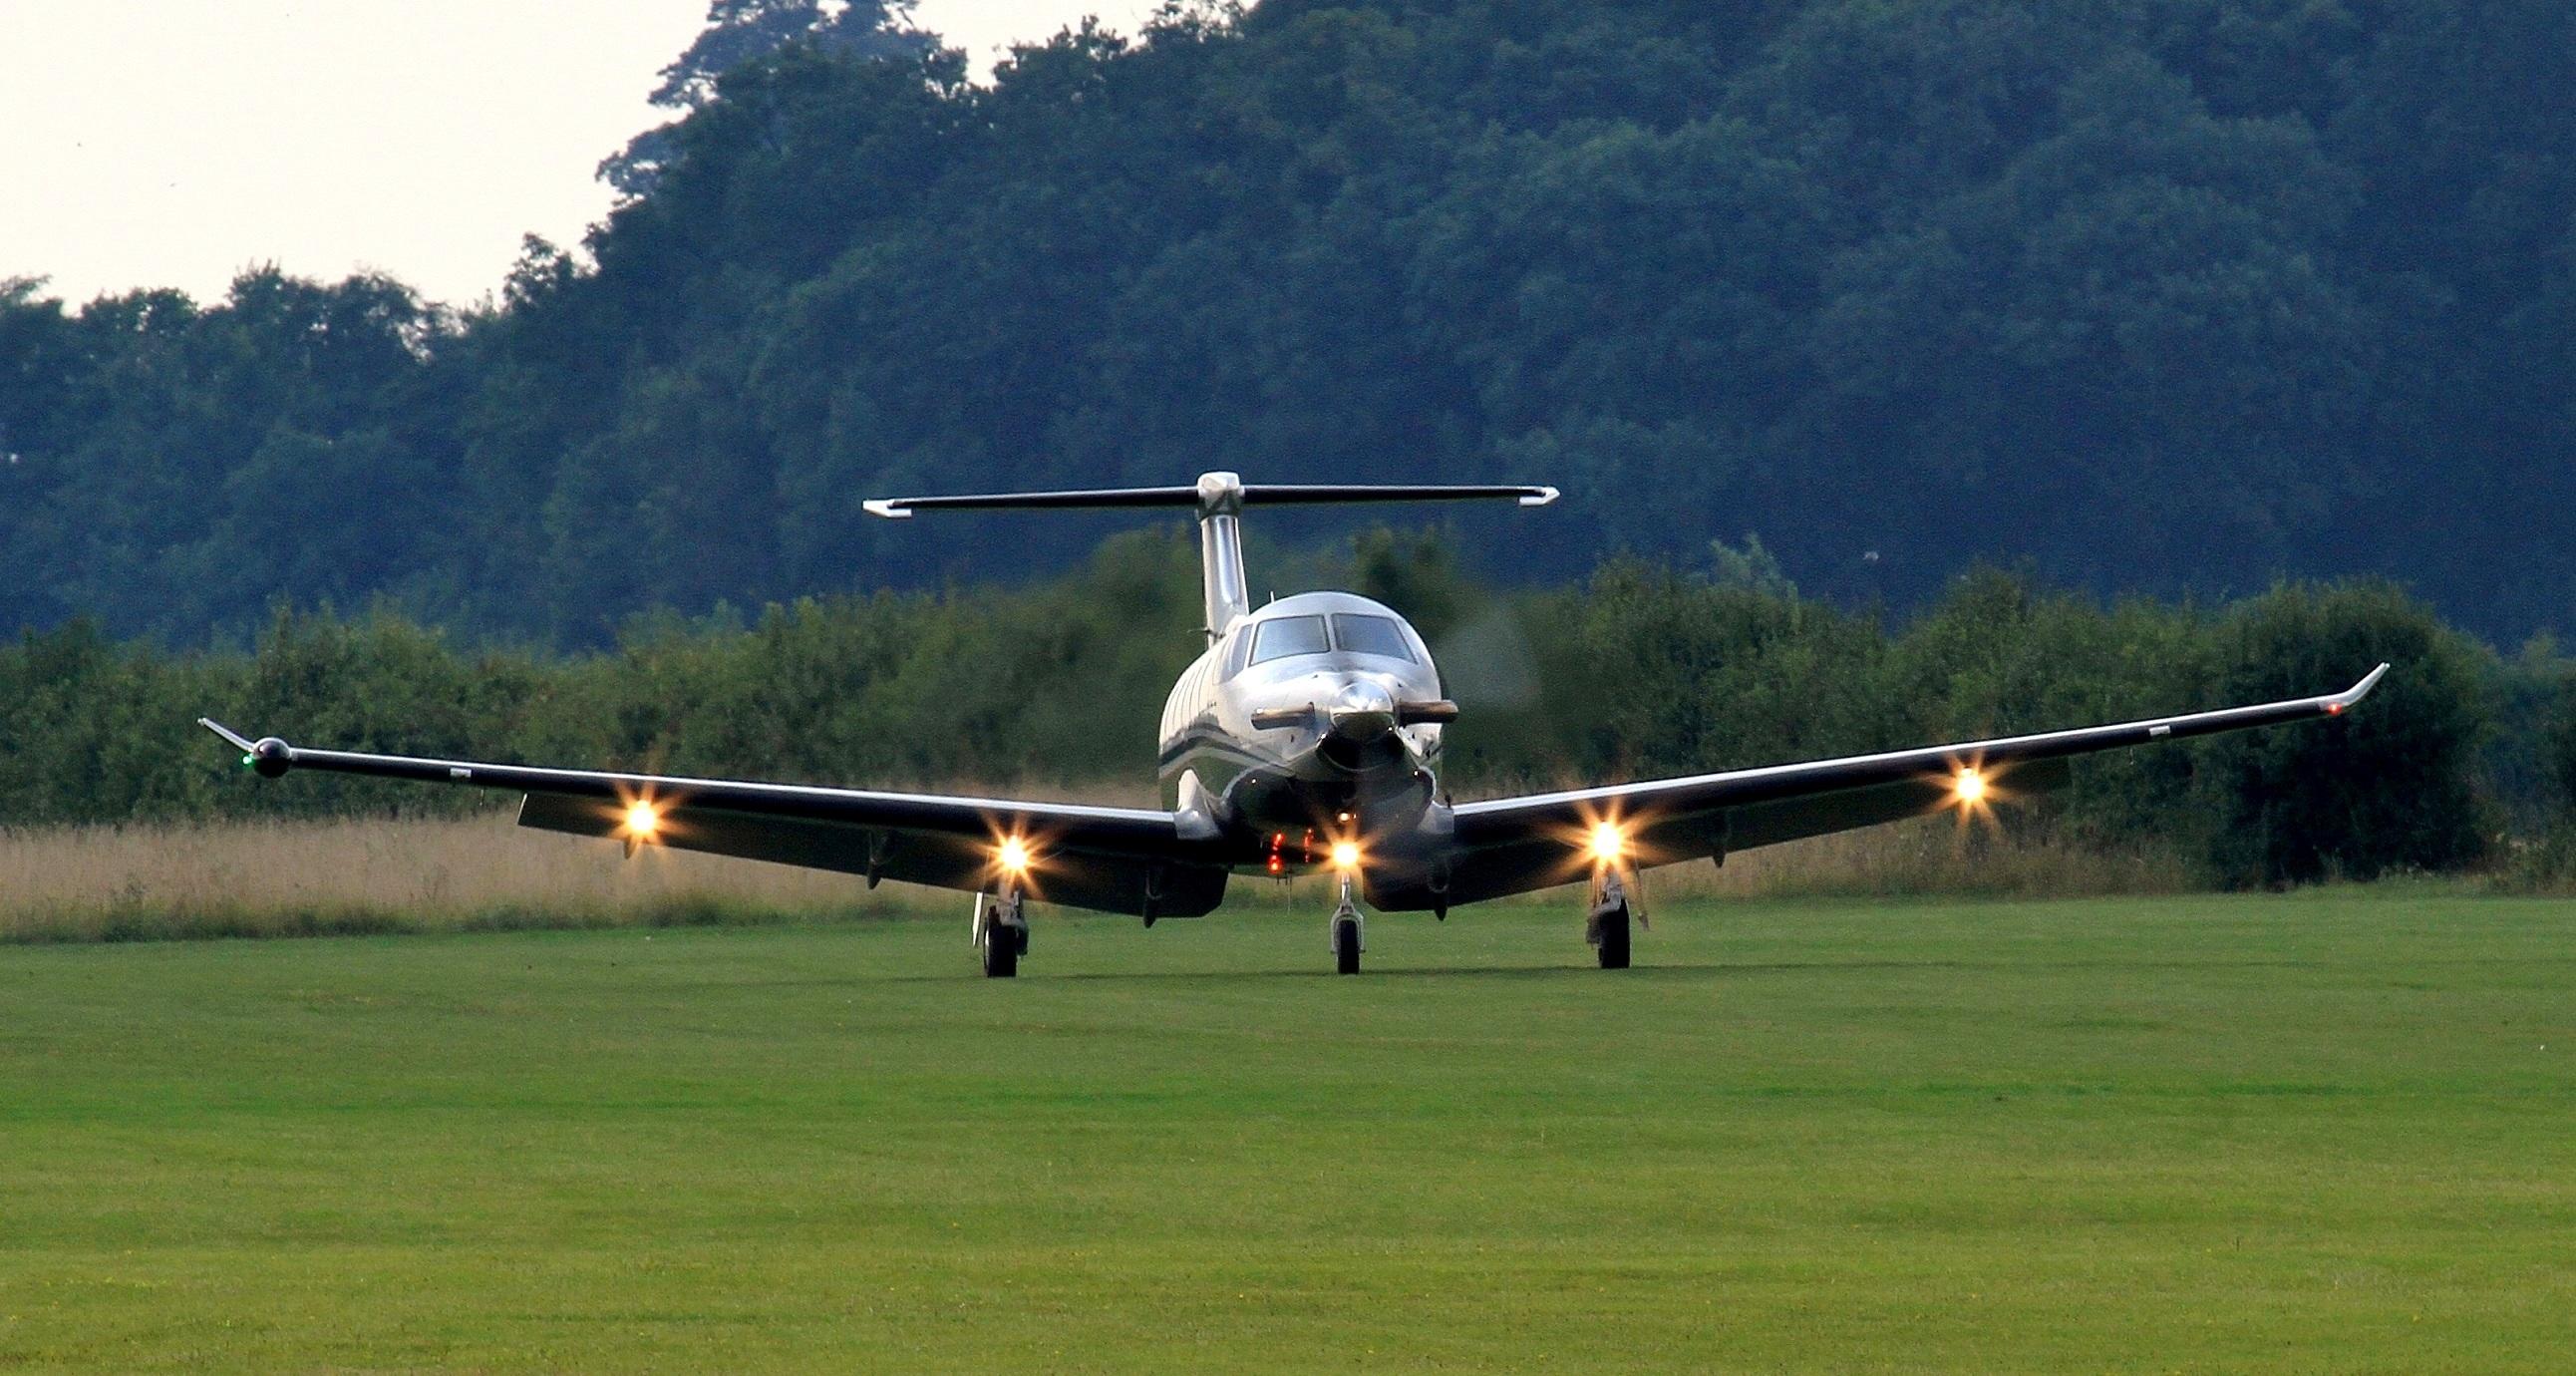 Fondos De Pantalla Pilatus Pc 12 Avión Despegando